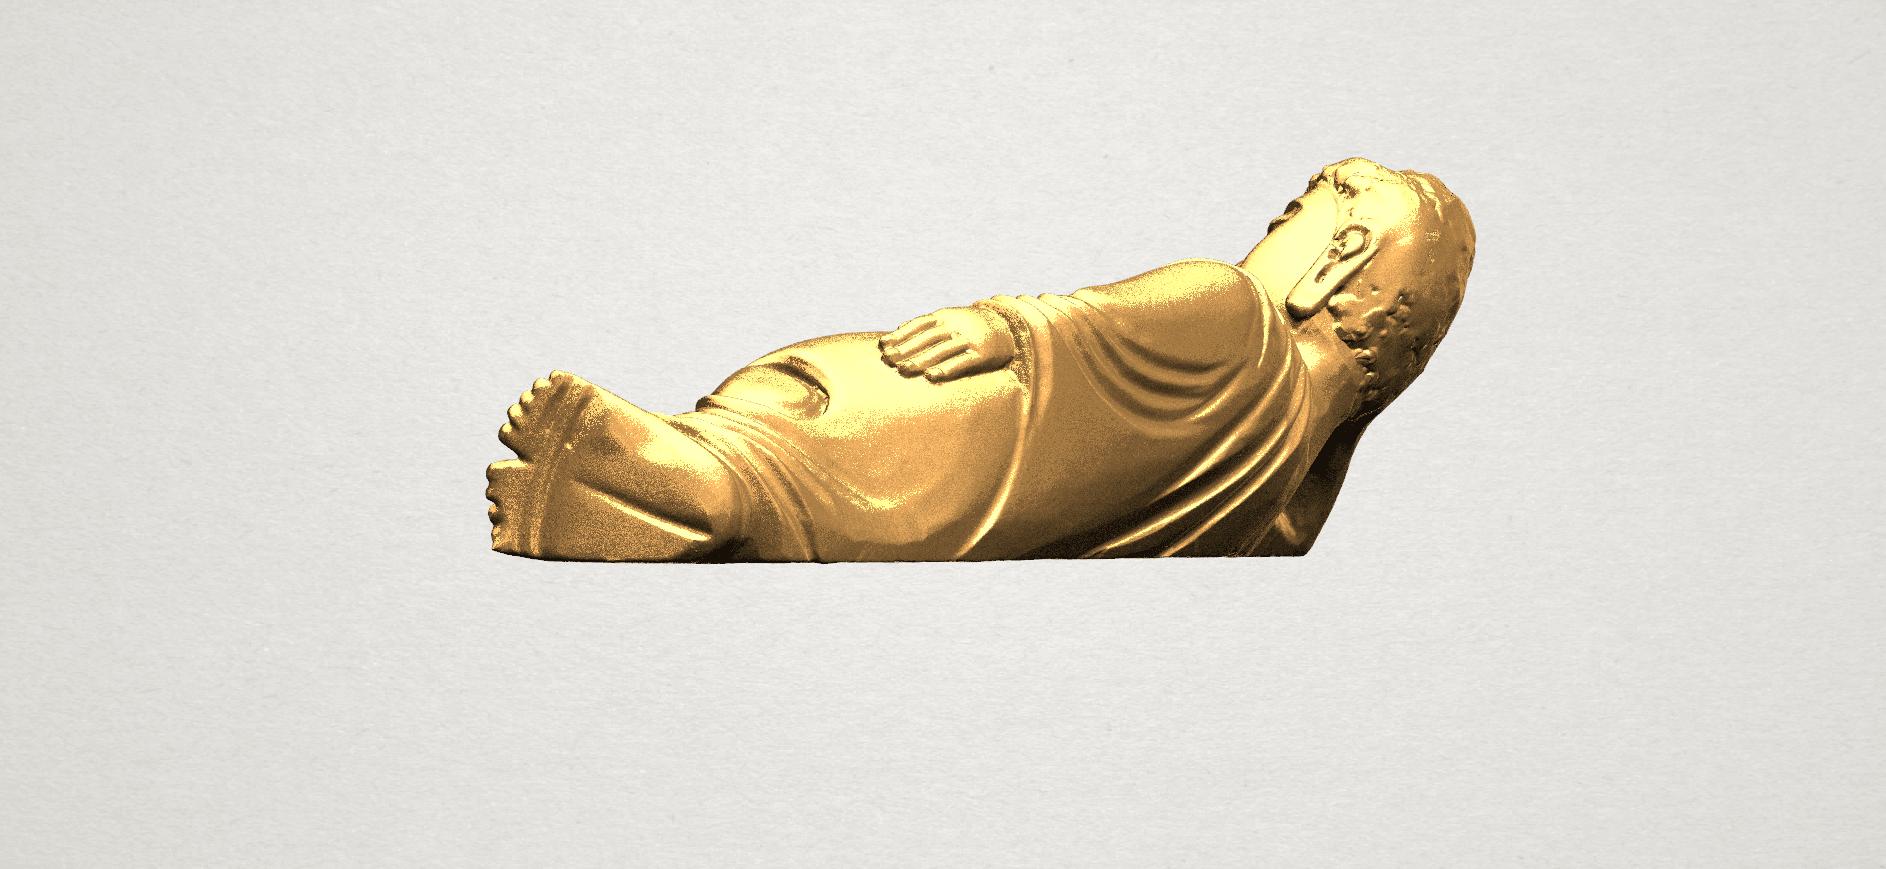 Sleeping Buddha (i) A04.png Download free STL file Sleeping Buddha 01 • 3D printable design, GeorgesNikkei